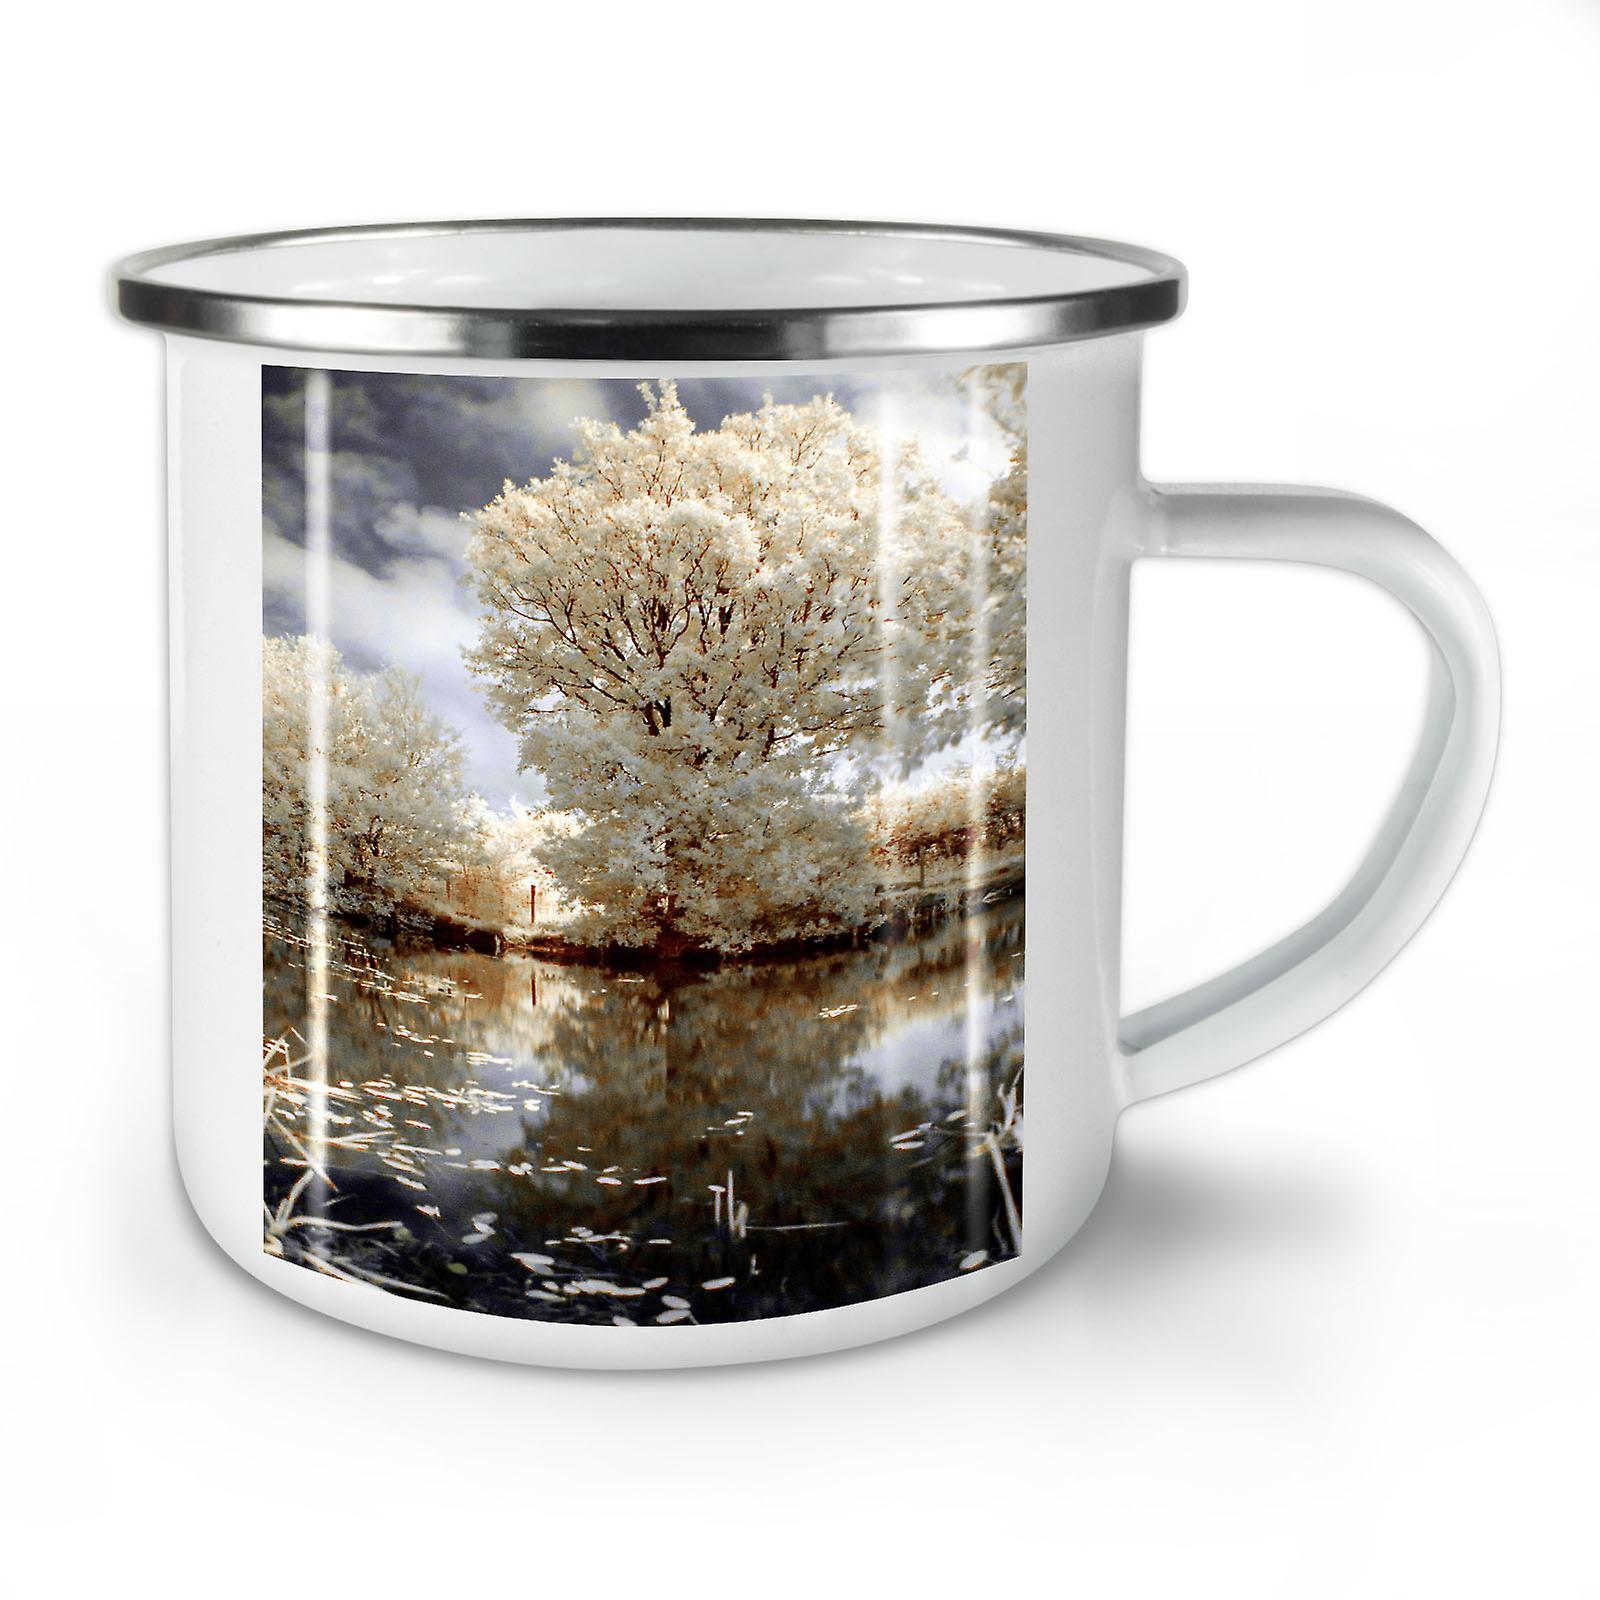 Mug10 Café OzWellcoda D'arbre Émail Lac Blanc Nature Nouveau Whitetea H2ED9I